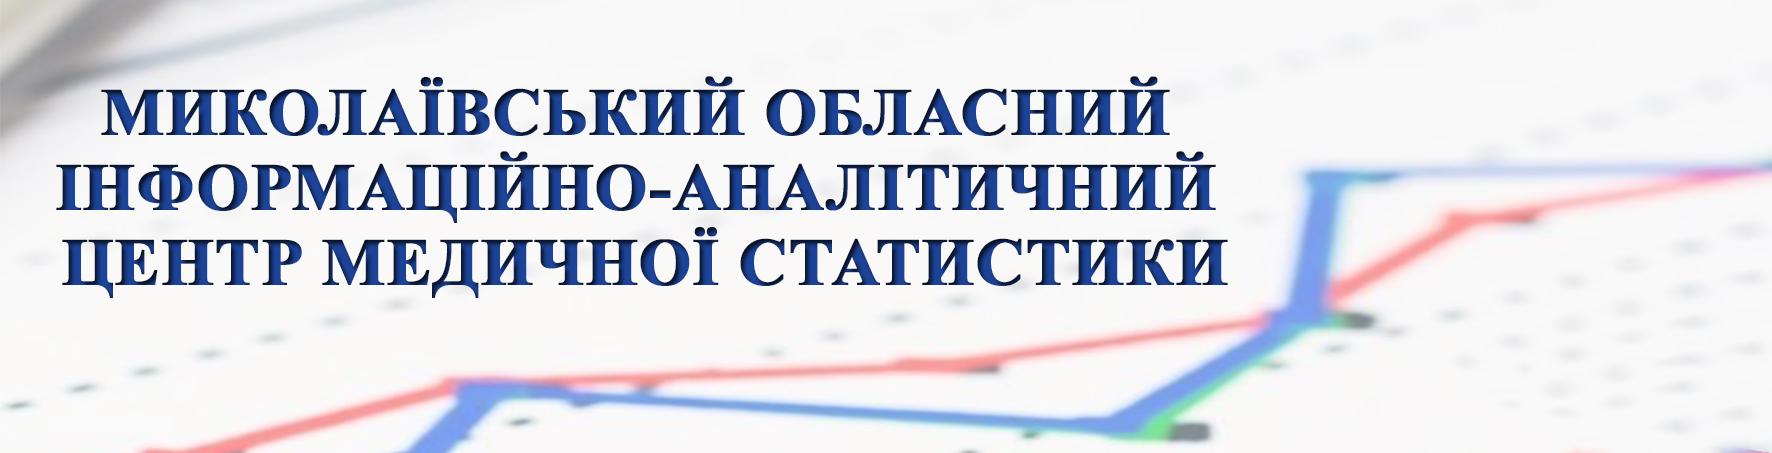 https://health-center.mk.ua/wp-content/uploads/2020/08/fake_logo.png 2x